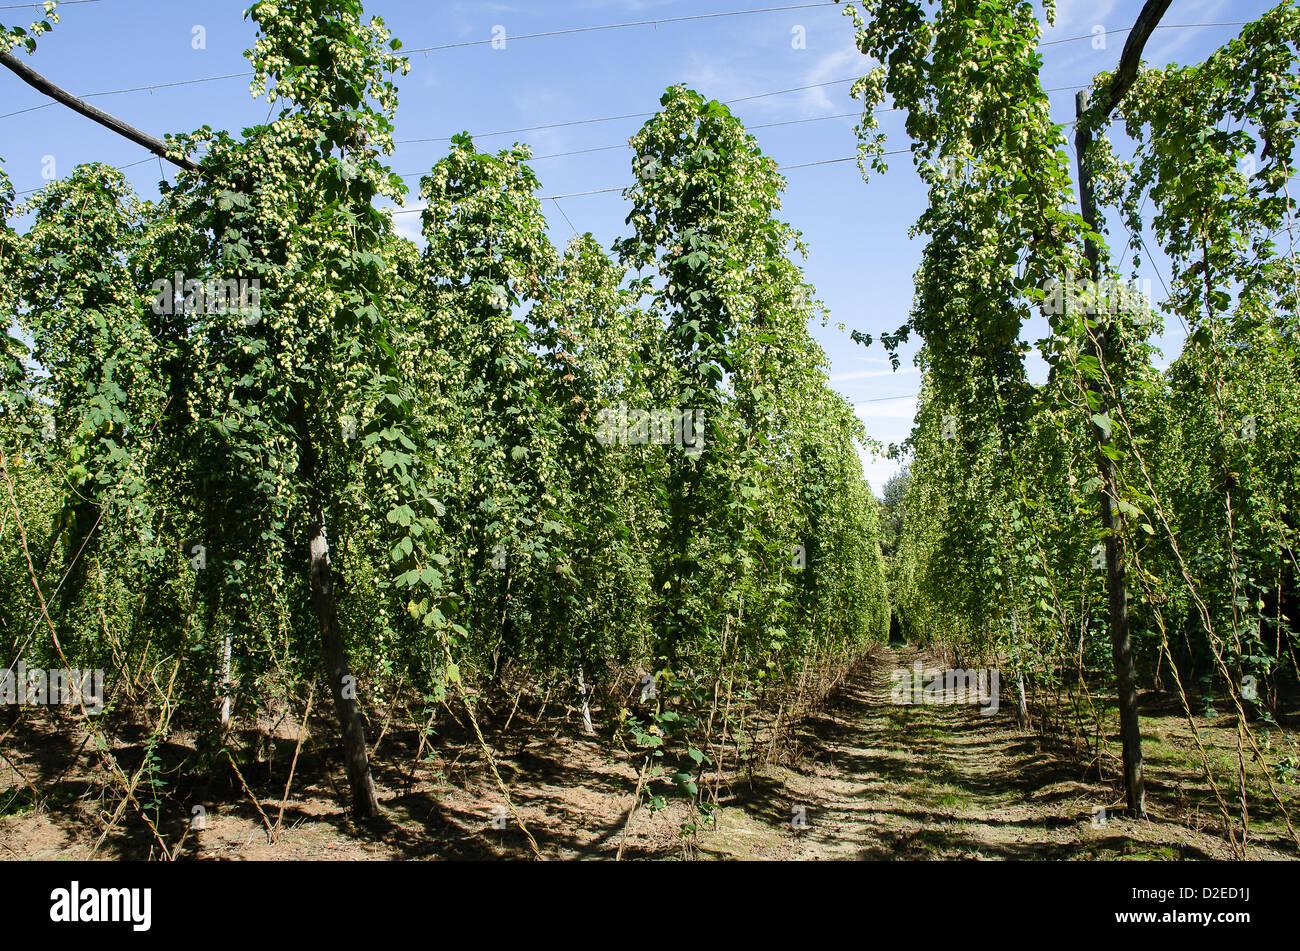 A hop garden in Kent - Stock Image